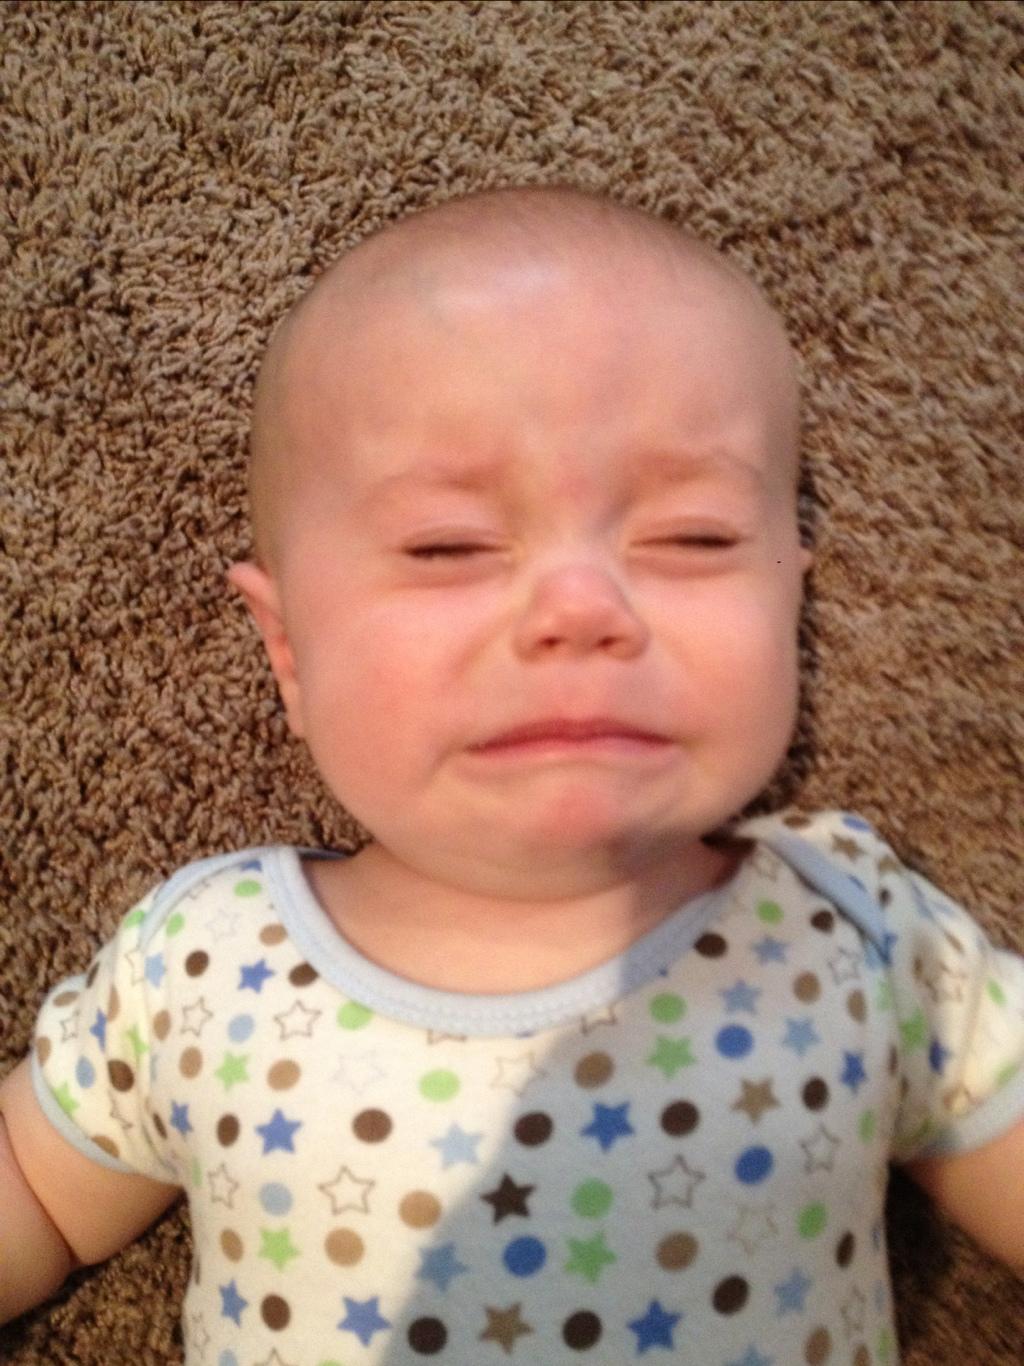 Momen Paling Pas Saat Memotret Bayi NEWMYINSPIRATIONSISTER